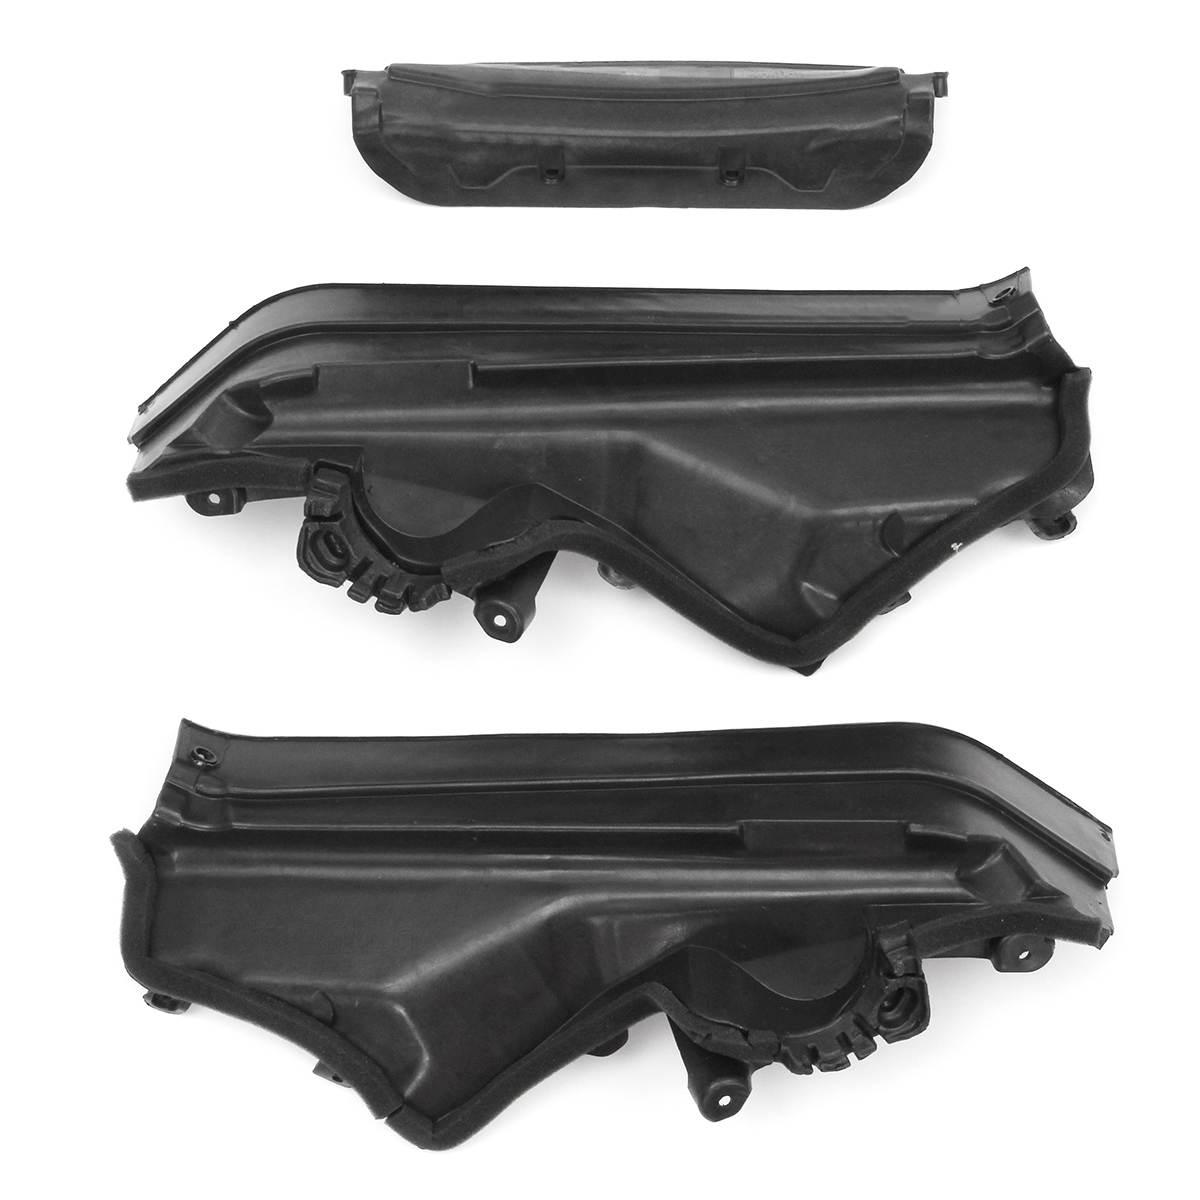 Hohe Qualität 3 stücke Auto Motor Obere Fach Partition Panel Set Für BMW X5 X6 E70 E71 E72 51717169419 51717169420 51717169421